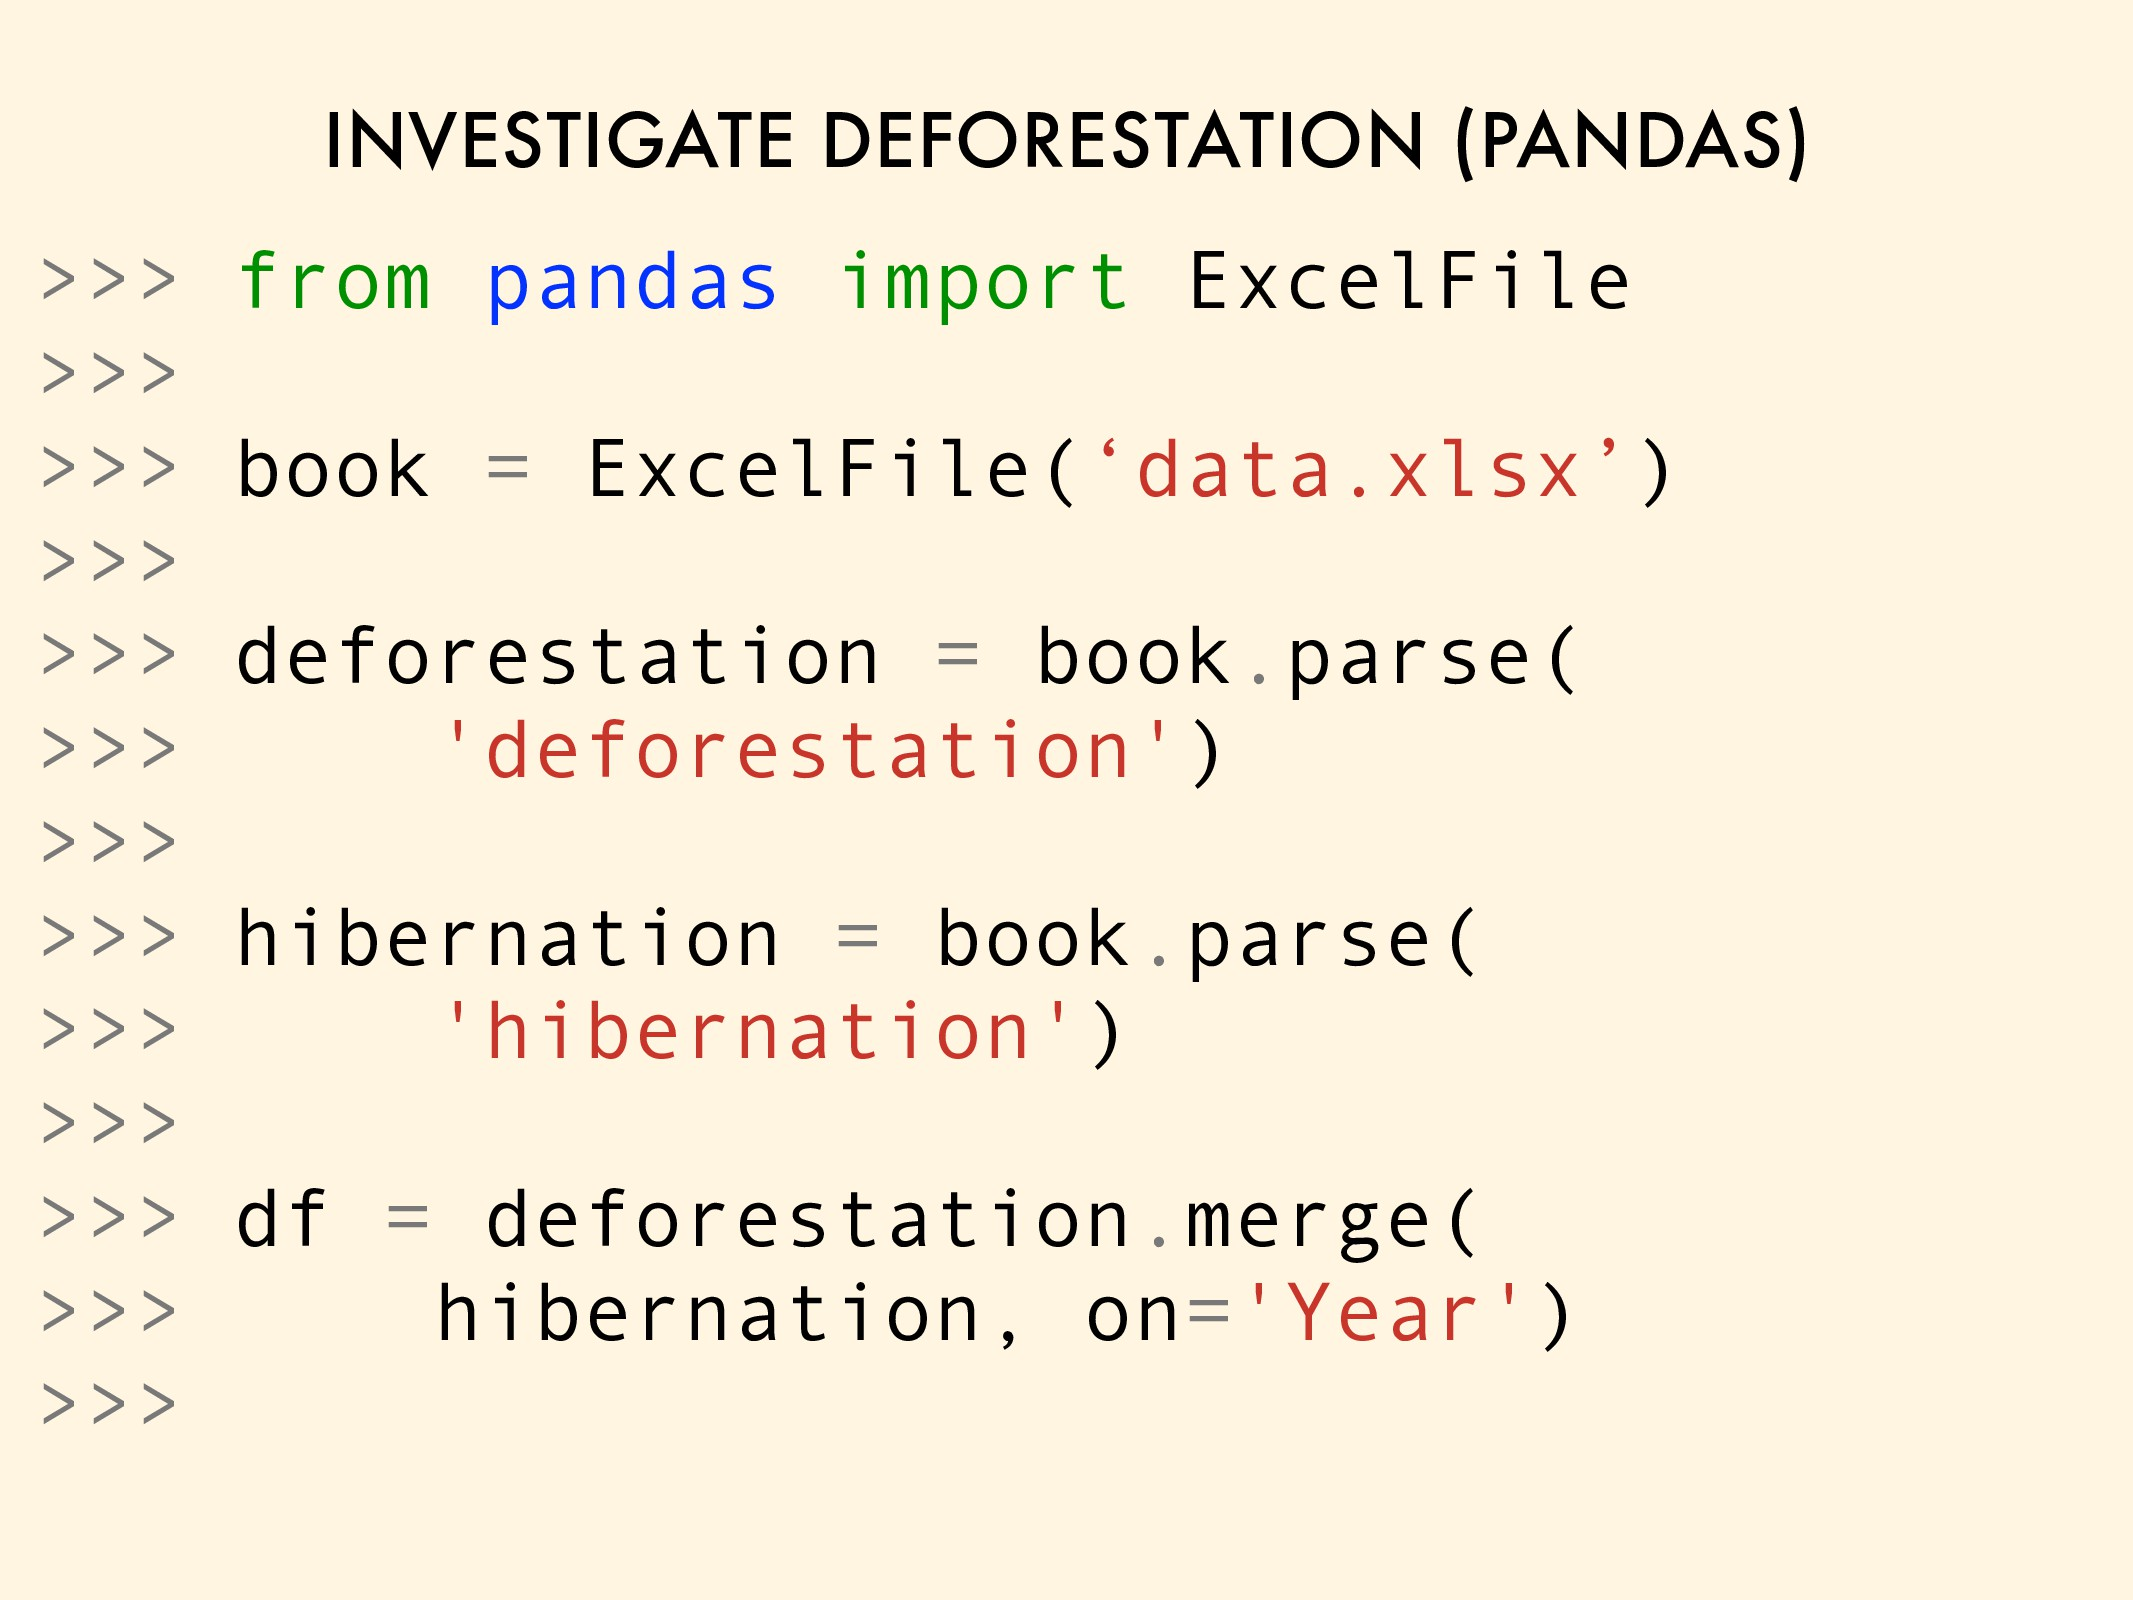 INVESTIGATE DEFORESTATION (PANDAS) >>> from pan...